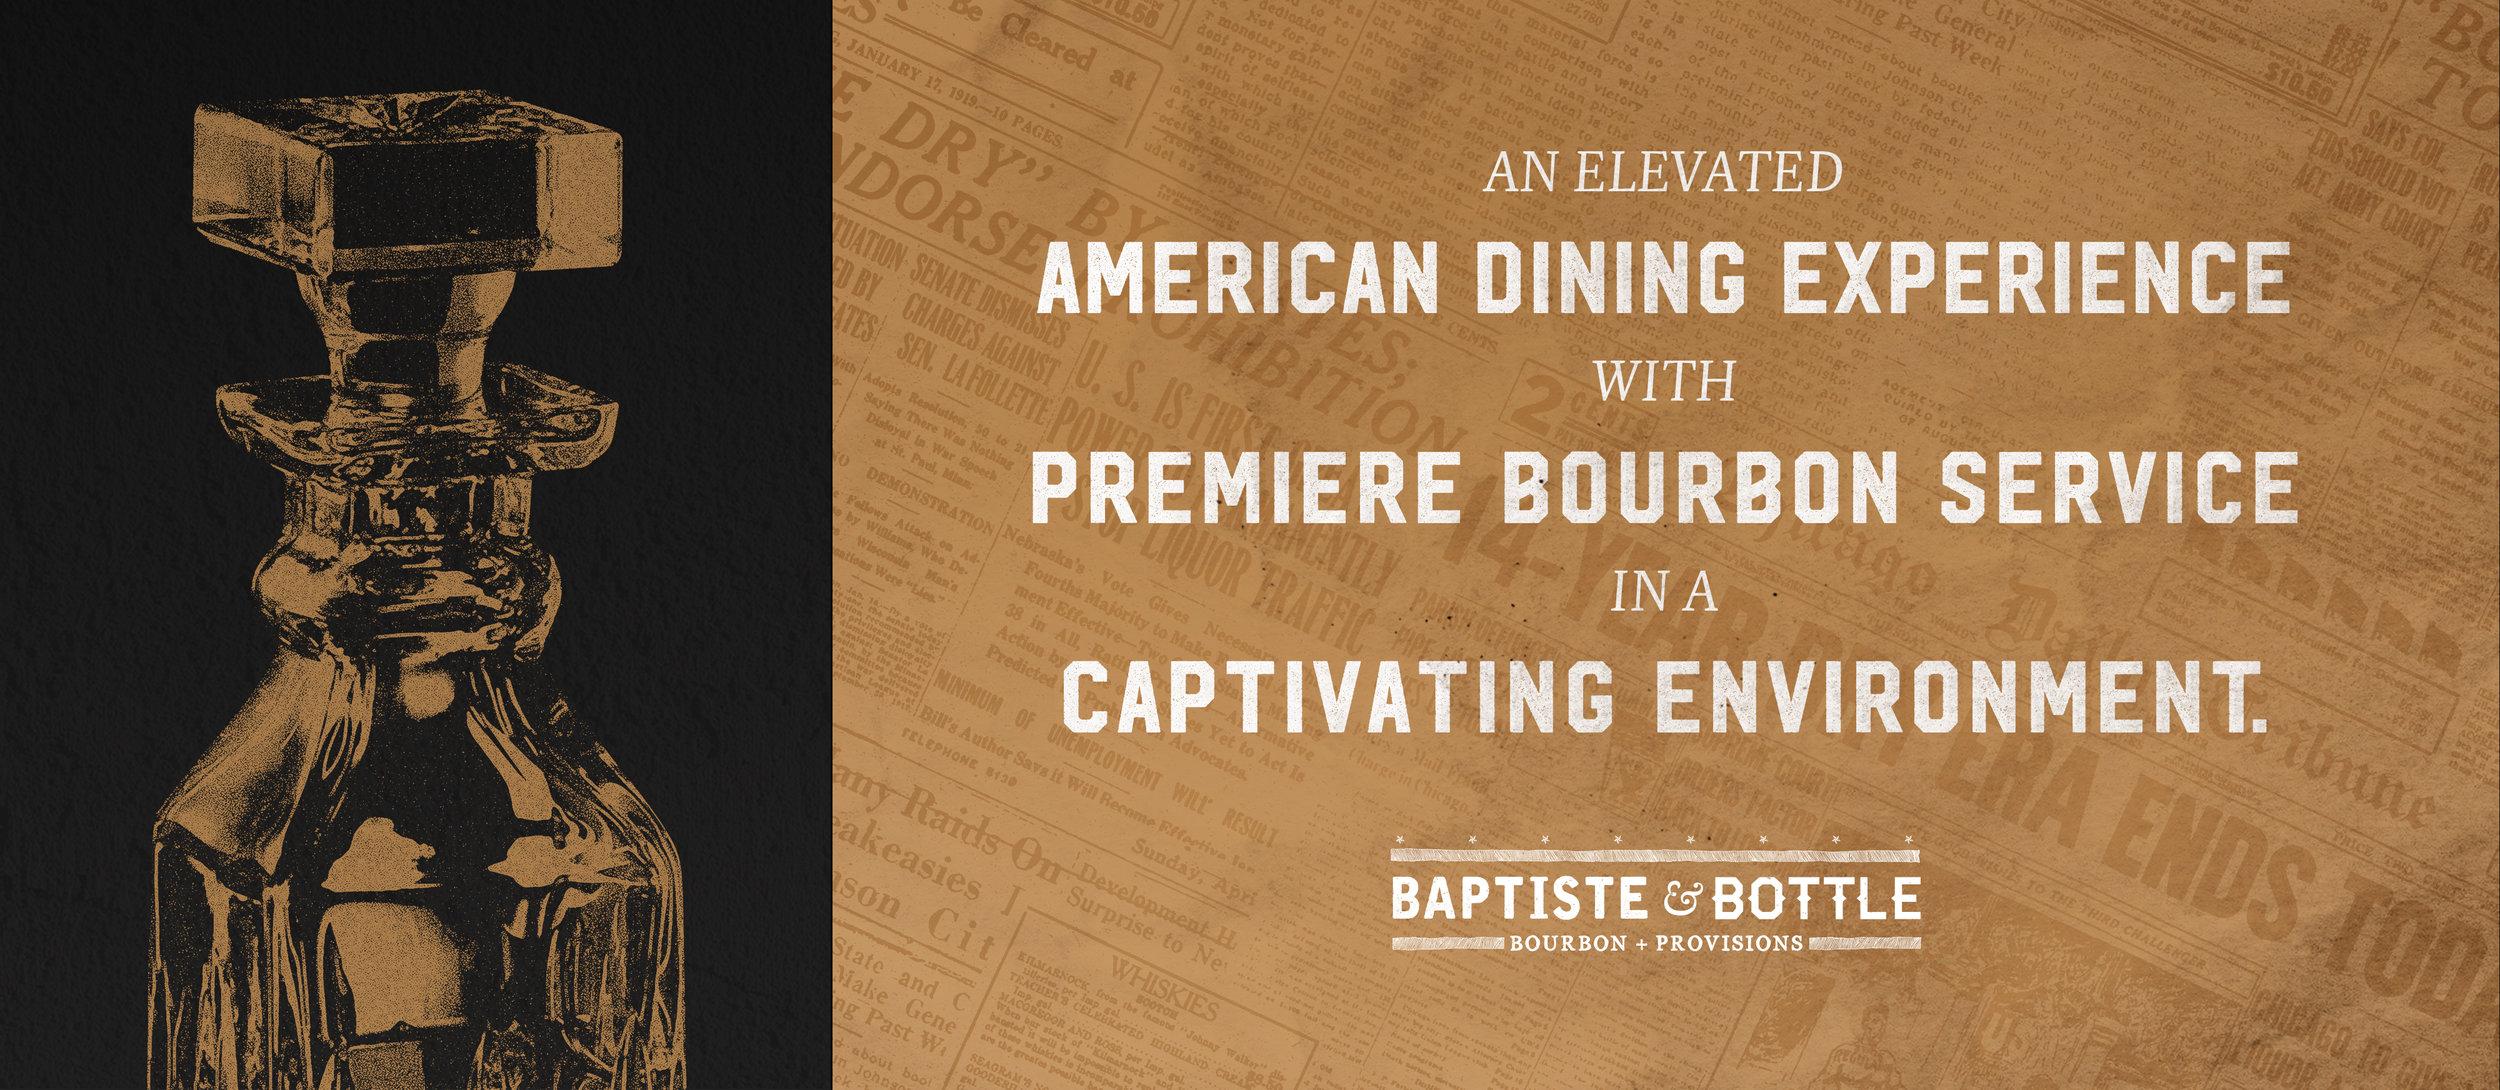 Baptiste & Bottle brand promise over prohibition era imagery